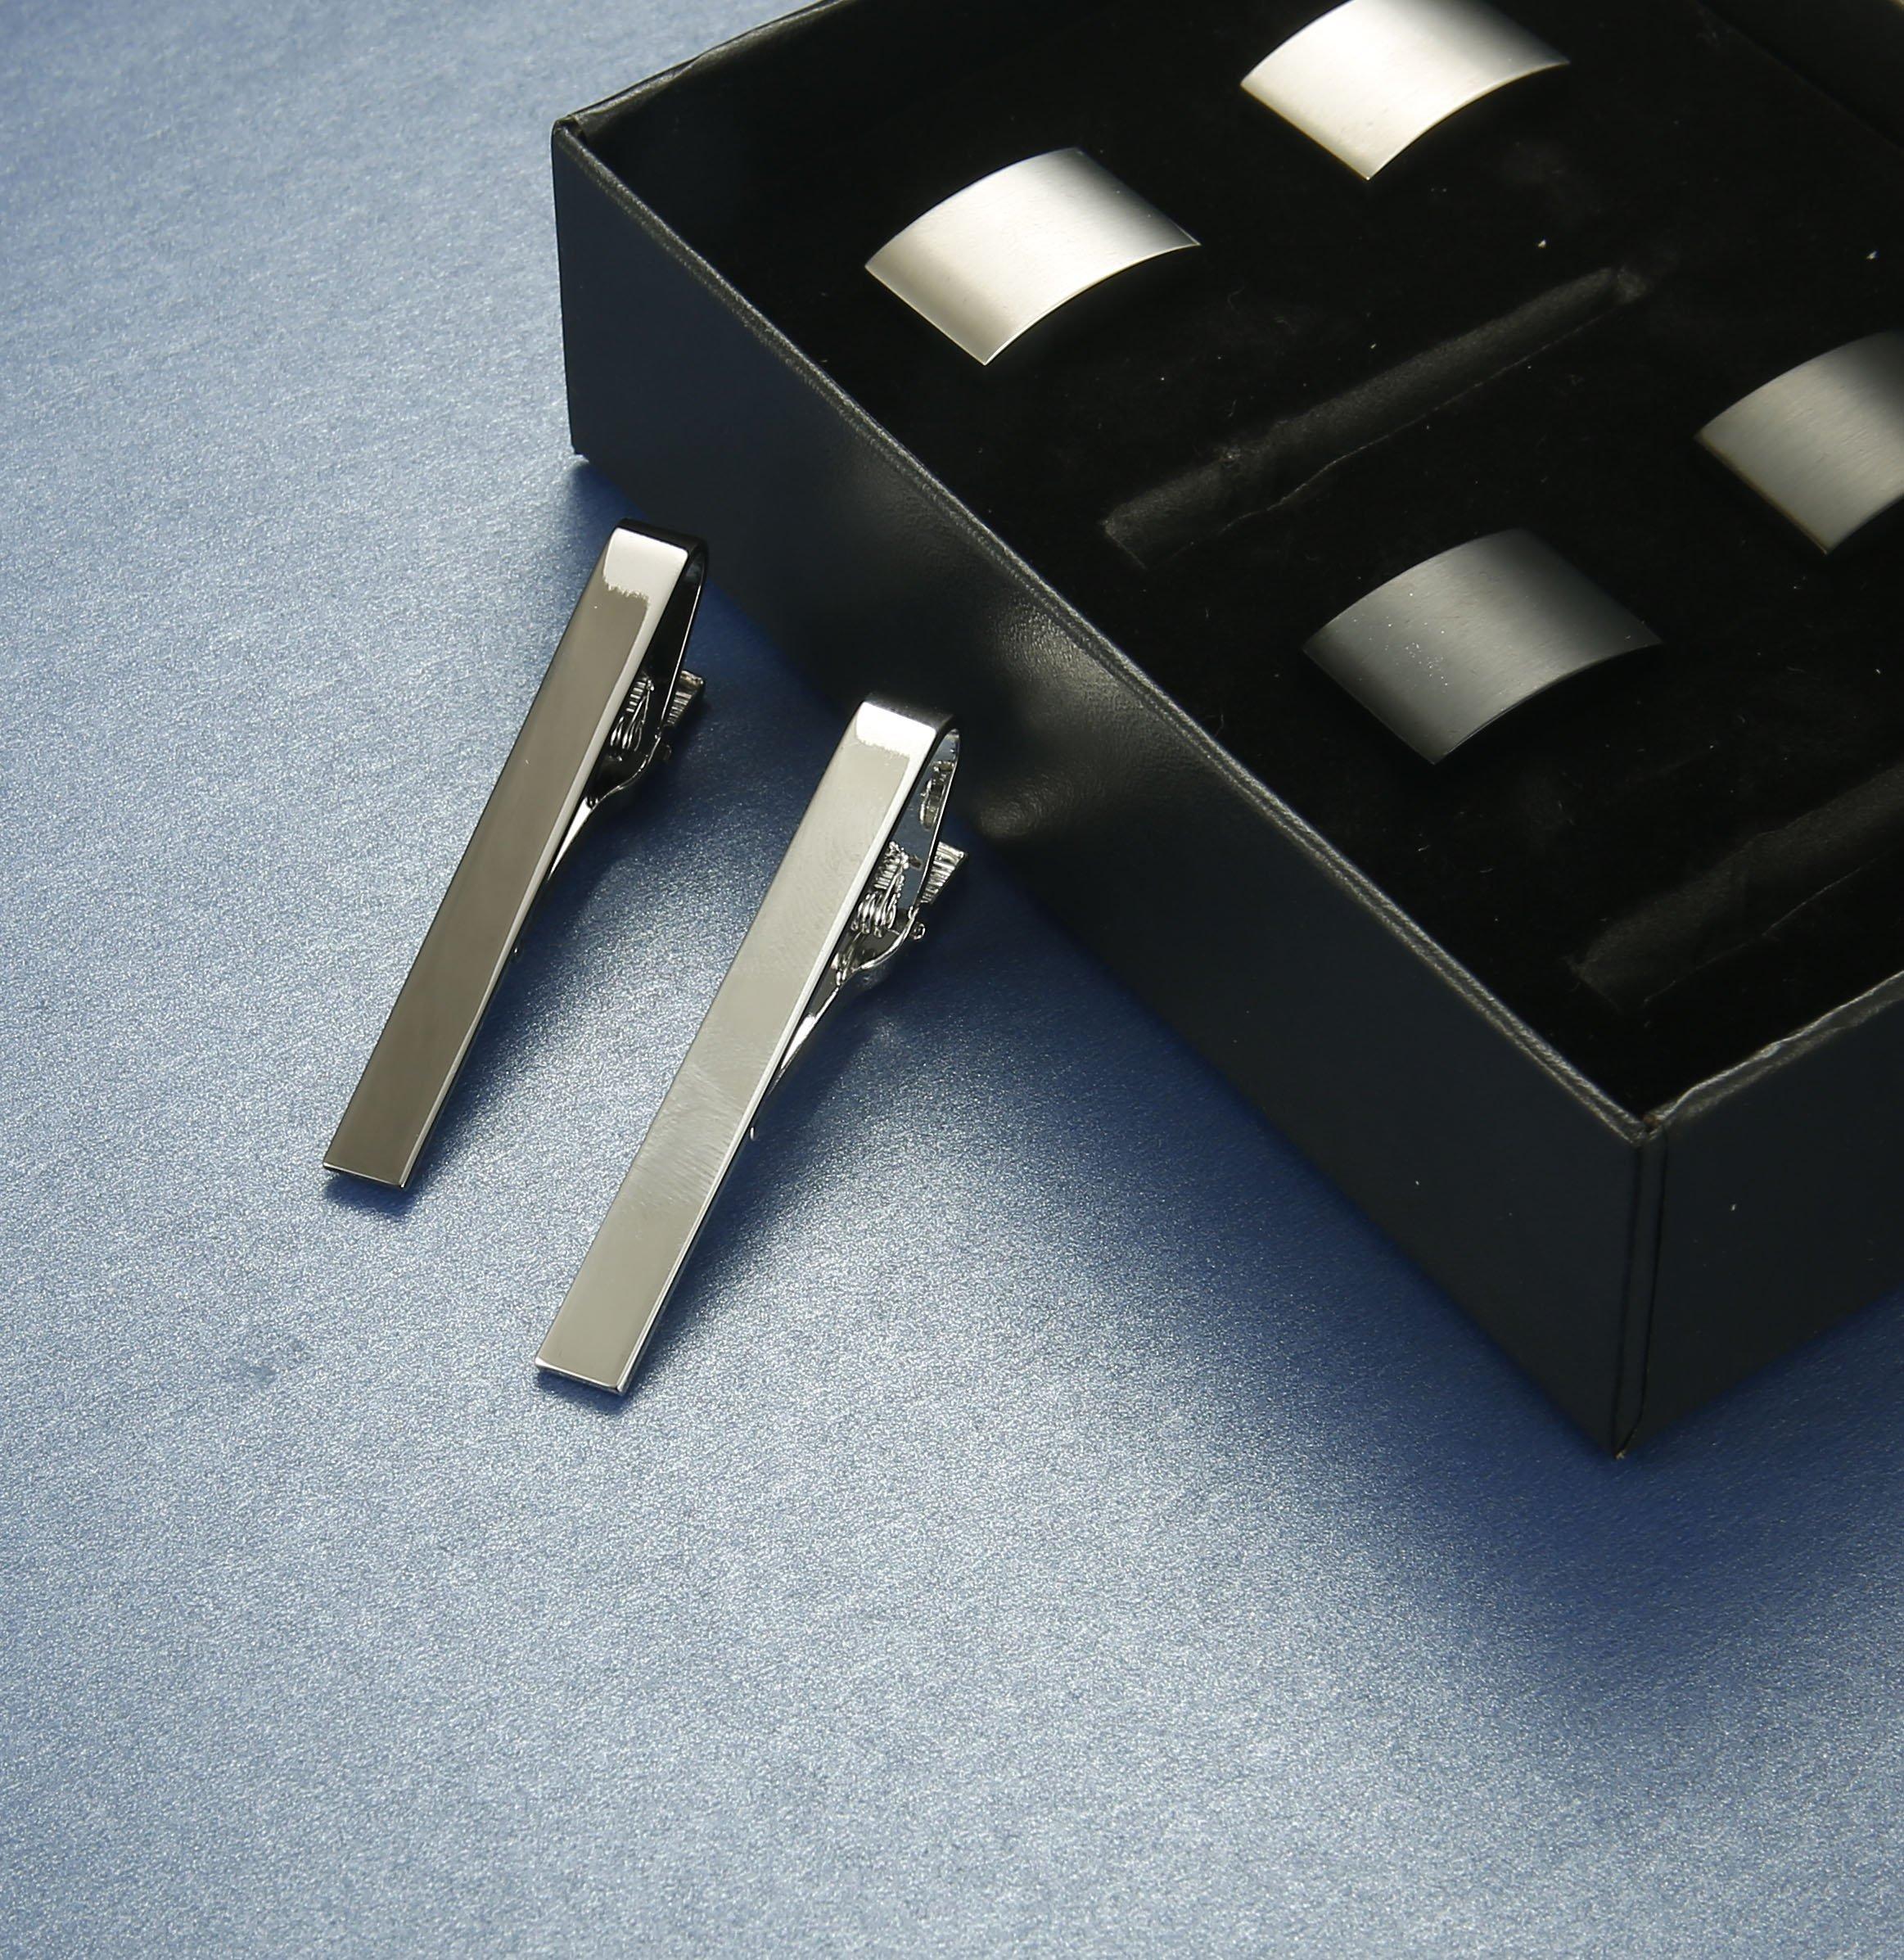 FIBO STEEL Tie Clips Cufflink Set for Men Classic Wedding Cufflinks Mens Dad Birthday Anniversary Gifts by FIBO STEEL (Image #4)